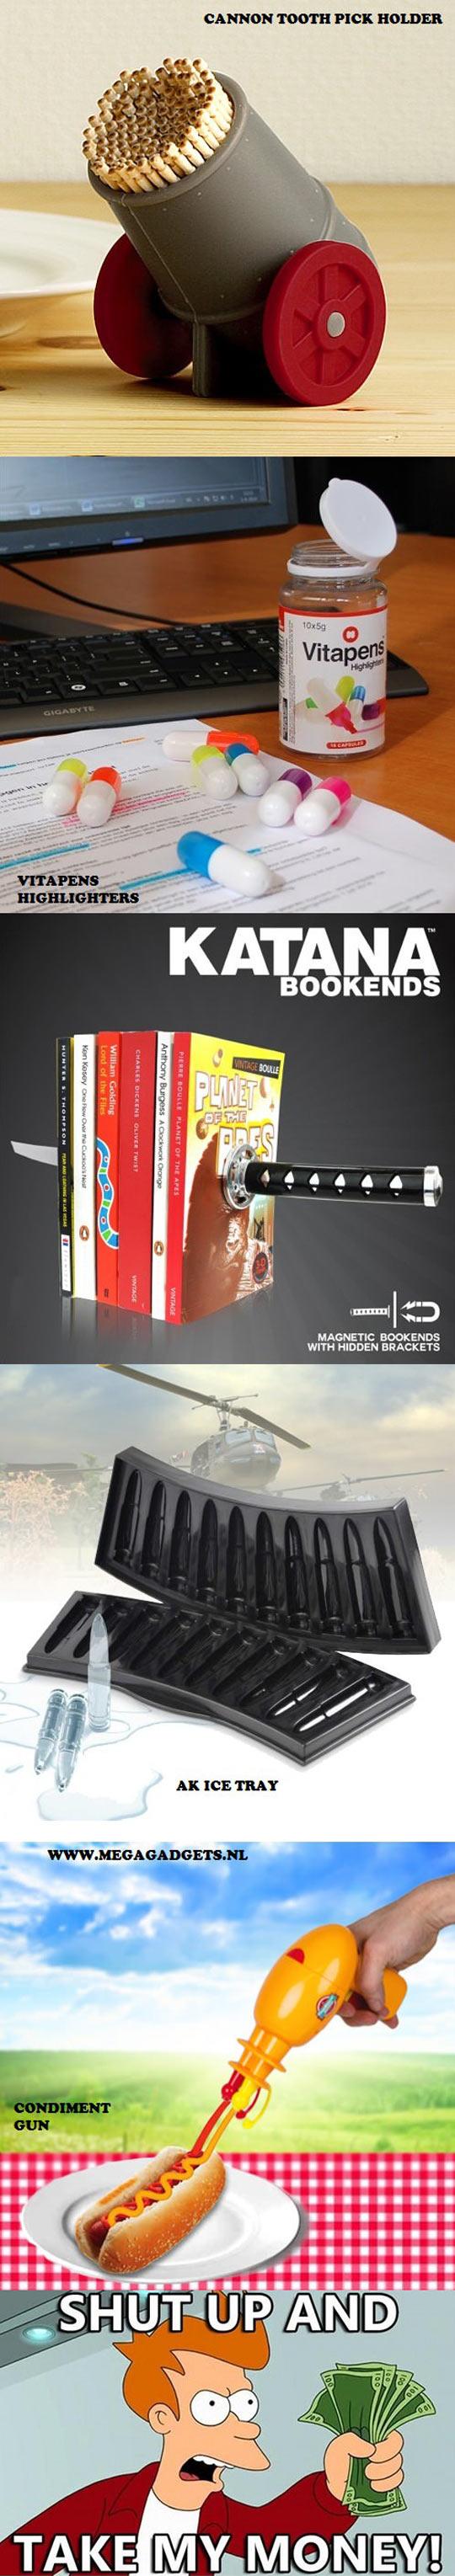 funny-incredible-stuff-book-holder